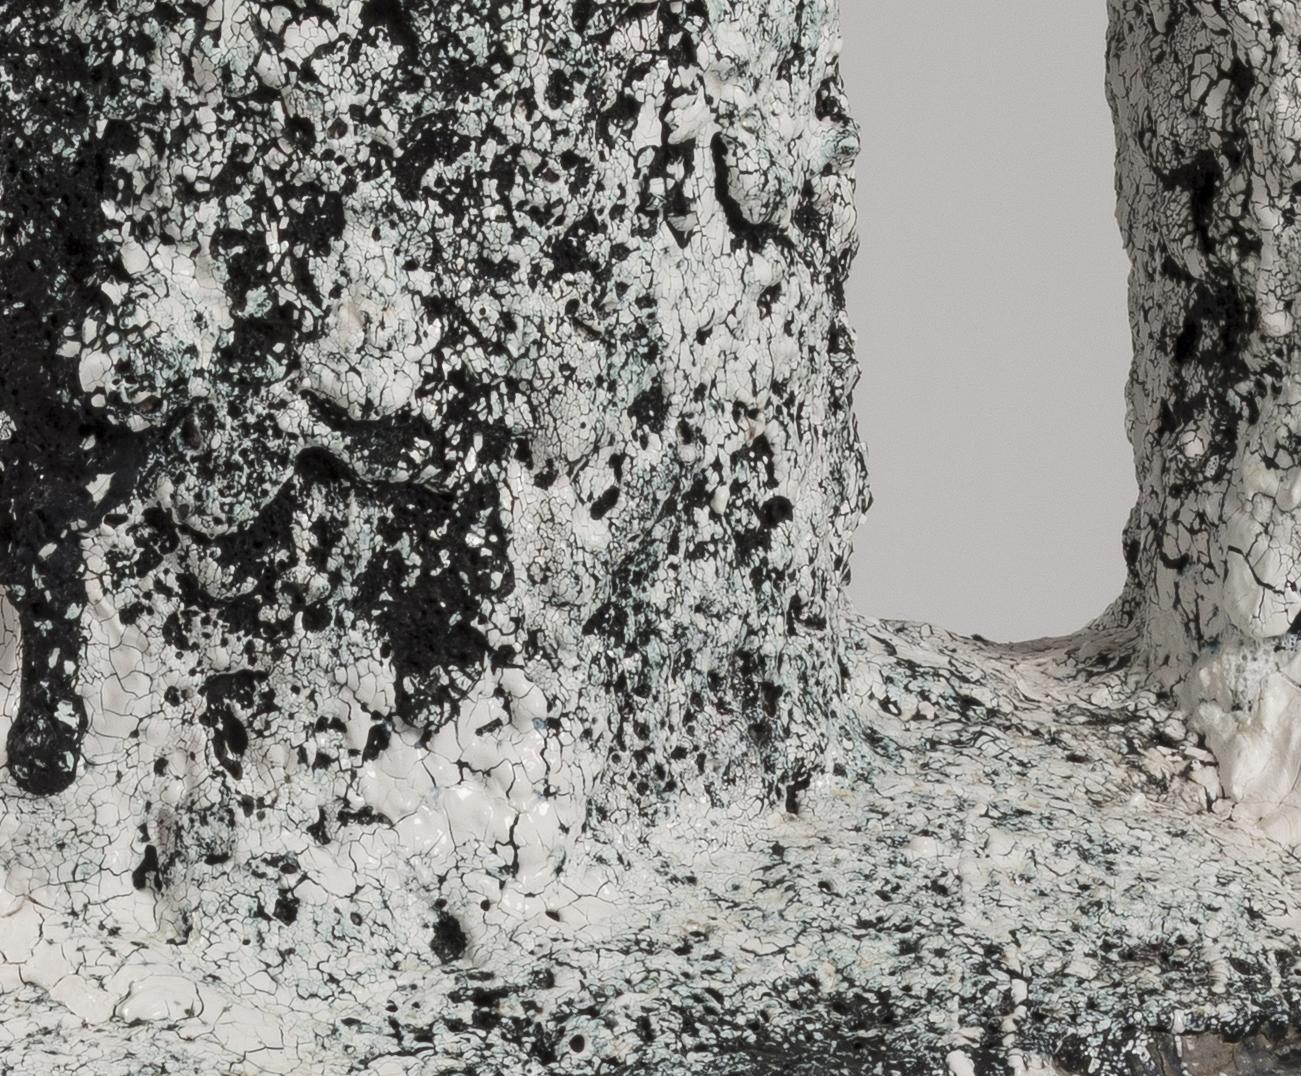 Tony Marsh. <em>Crucible Cham-Twin</em>, 2018. Ceramic, 21 x 34.5 x 23 inches (53.3 x 87.6 x 58.4 cm) Detail